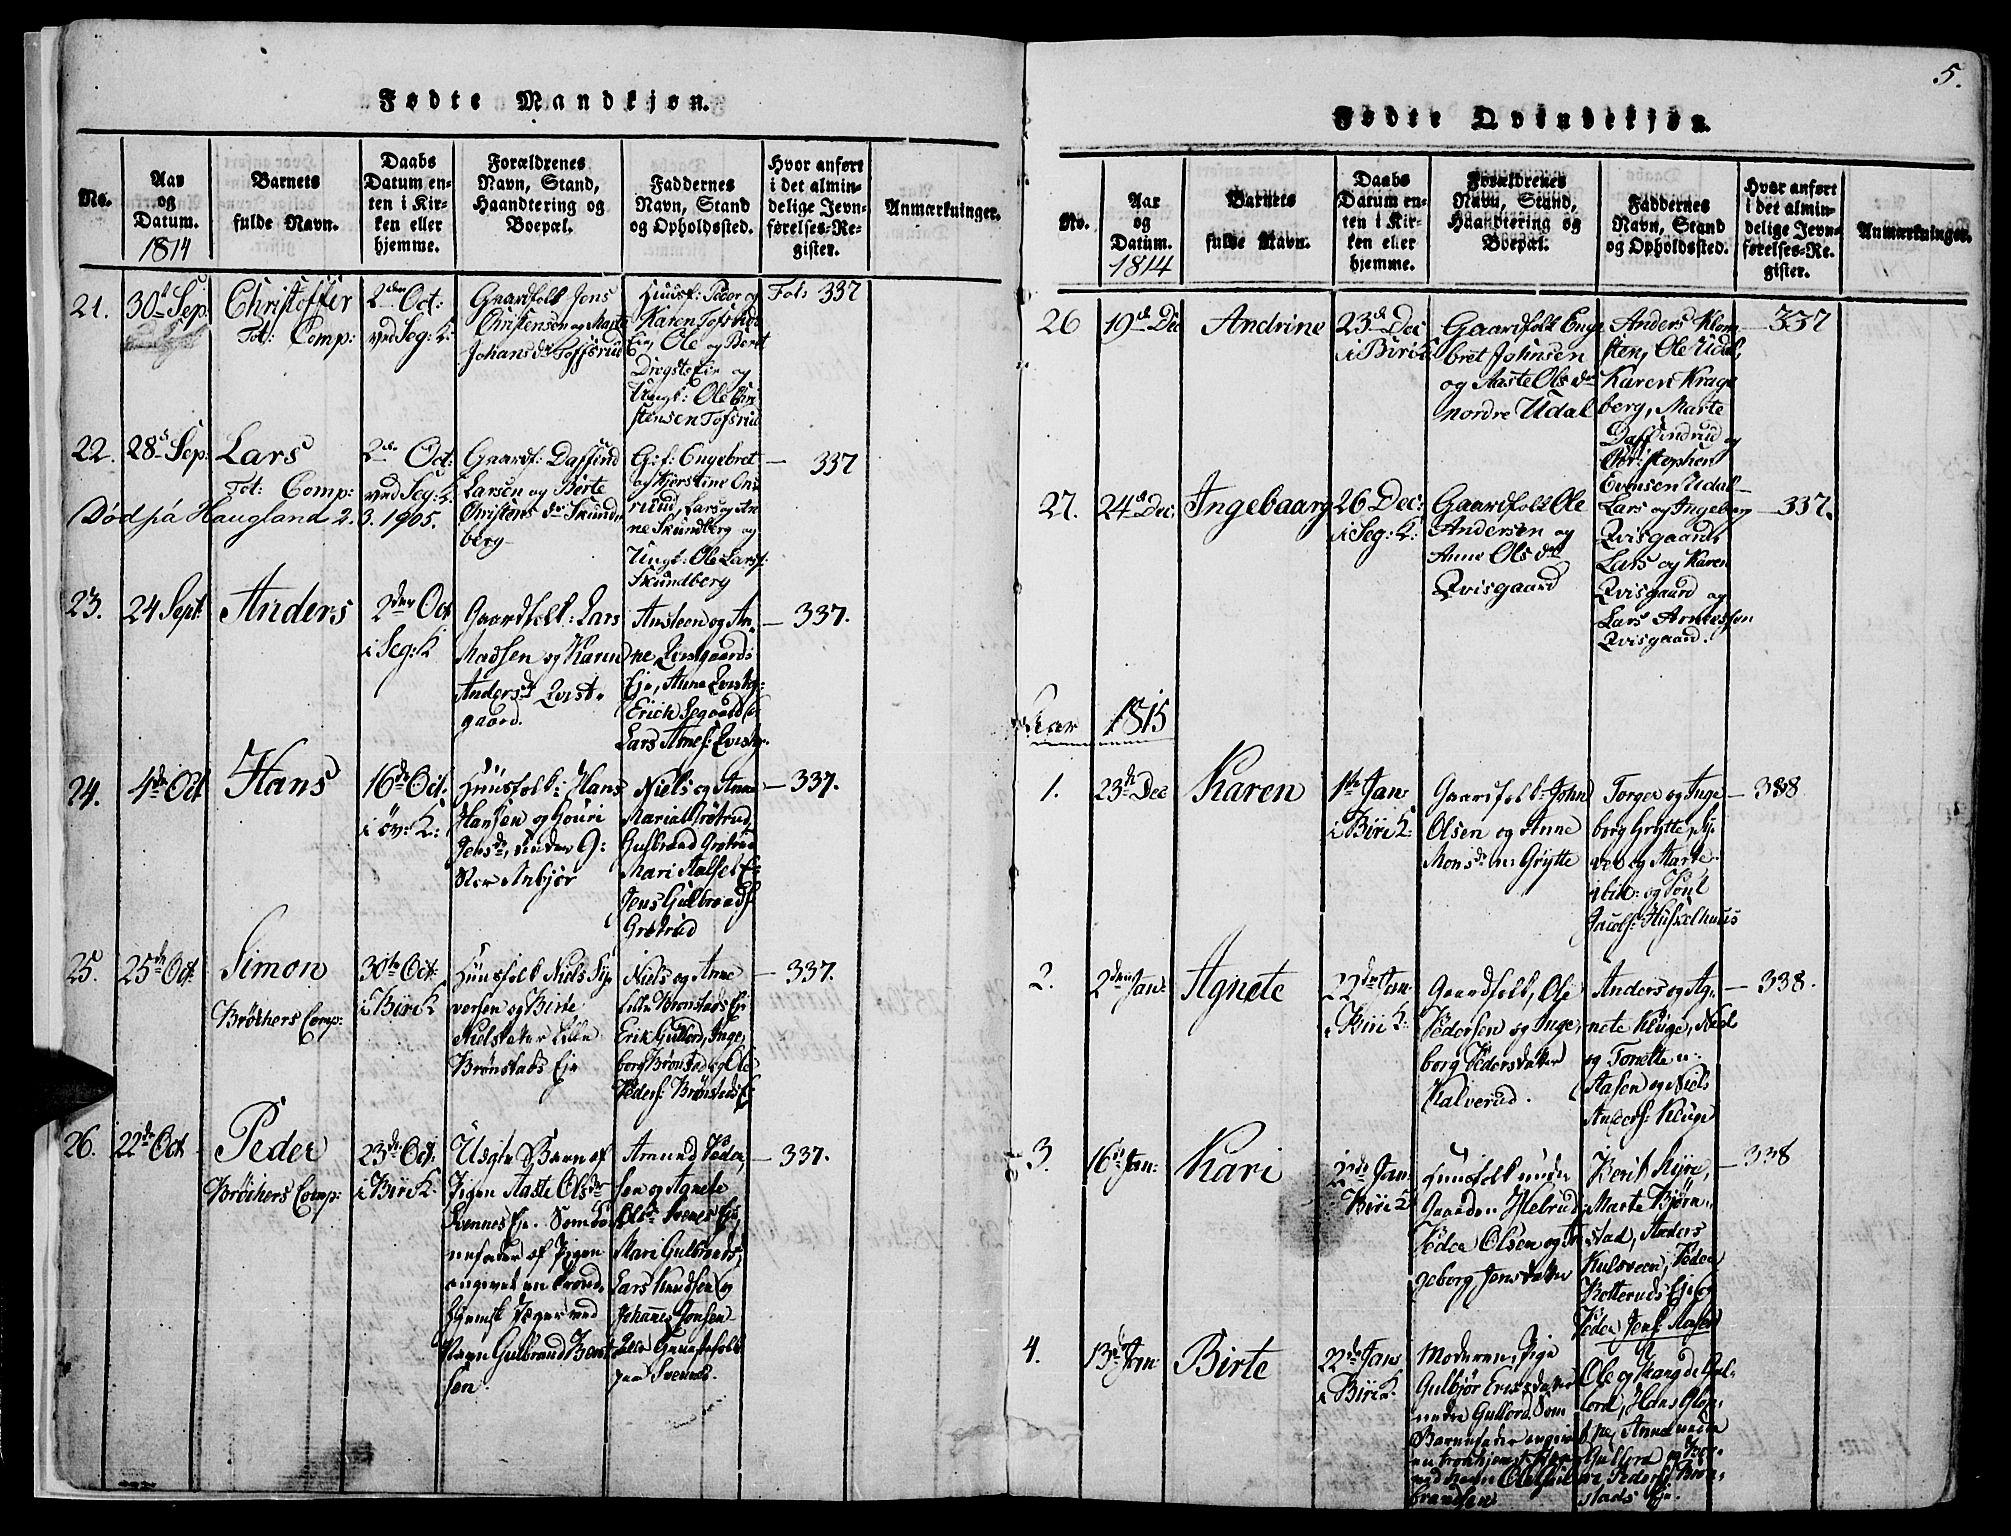 SAH, Biri prestekontor, Ministerialbok nr. 3, 1814-1828, s. 5